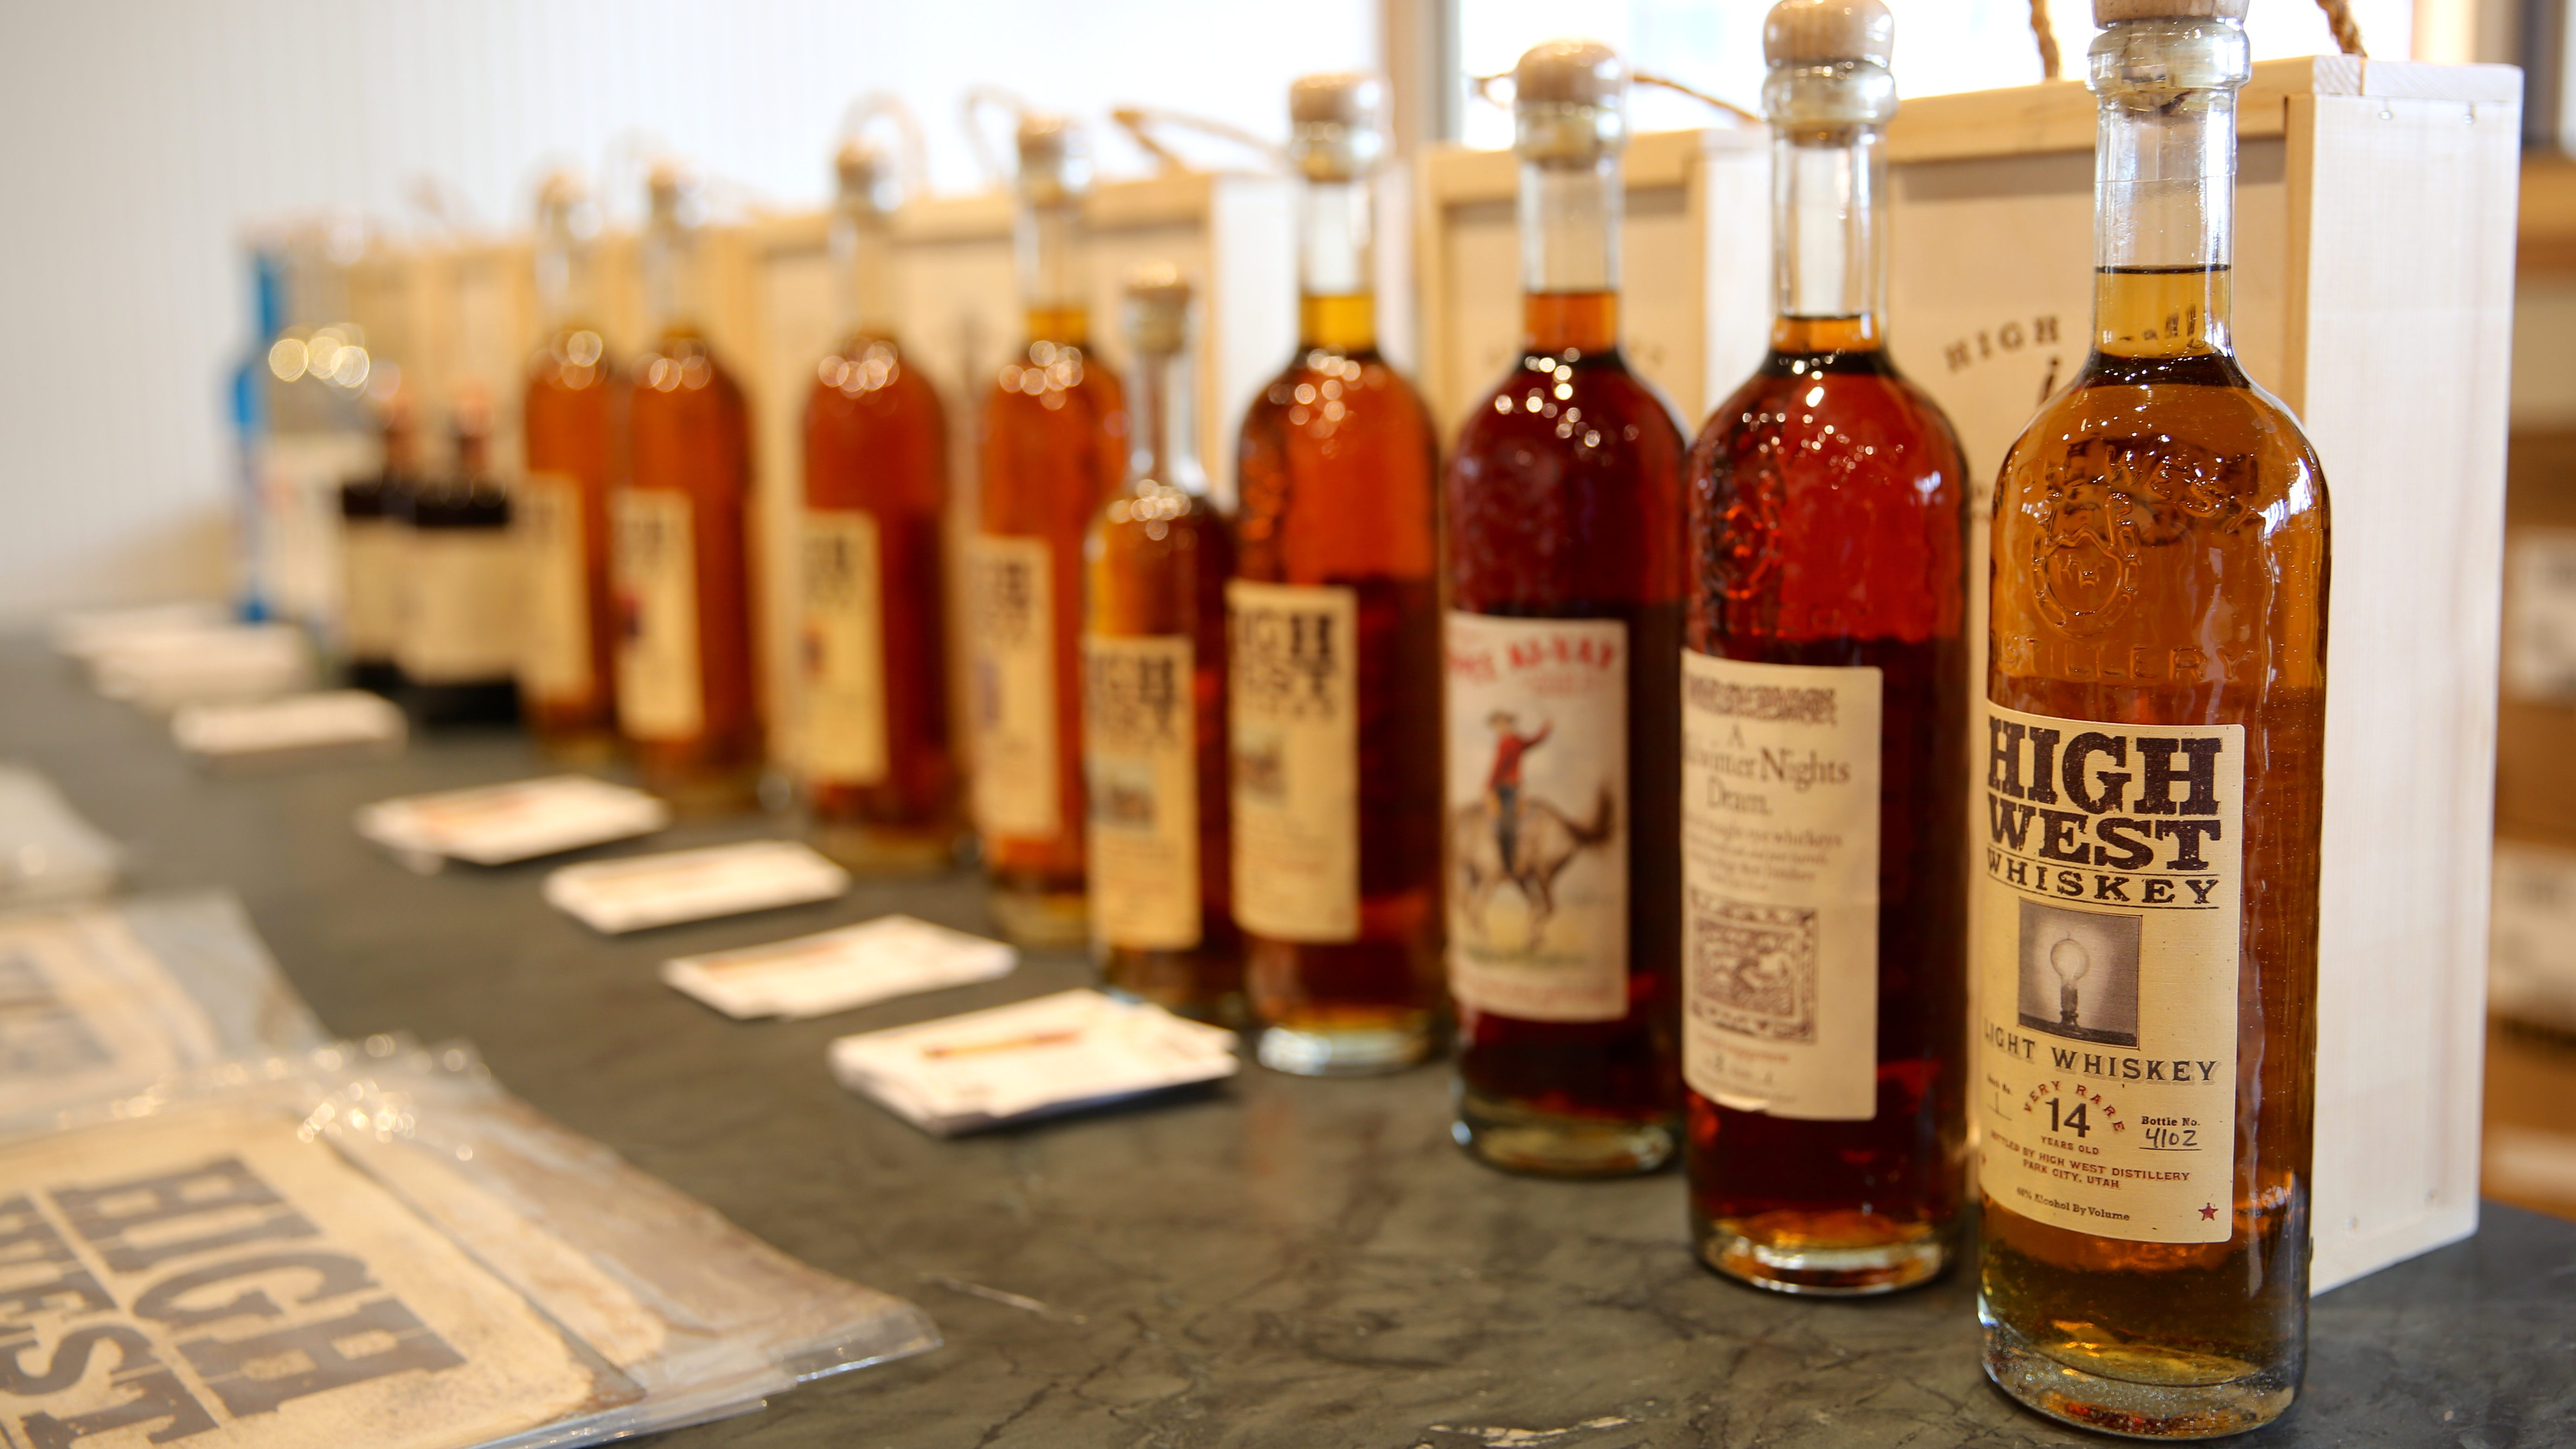 Bottles of High West whiskey.